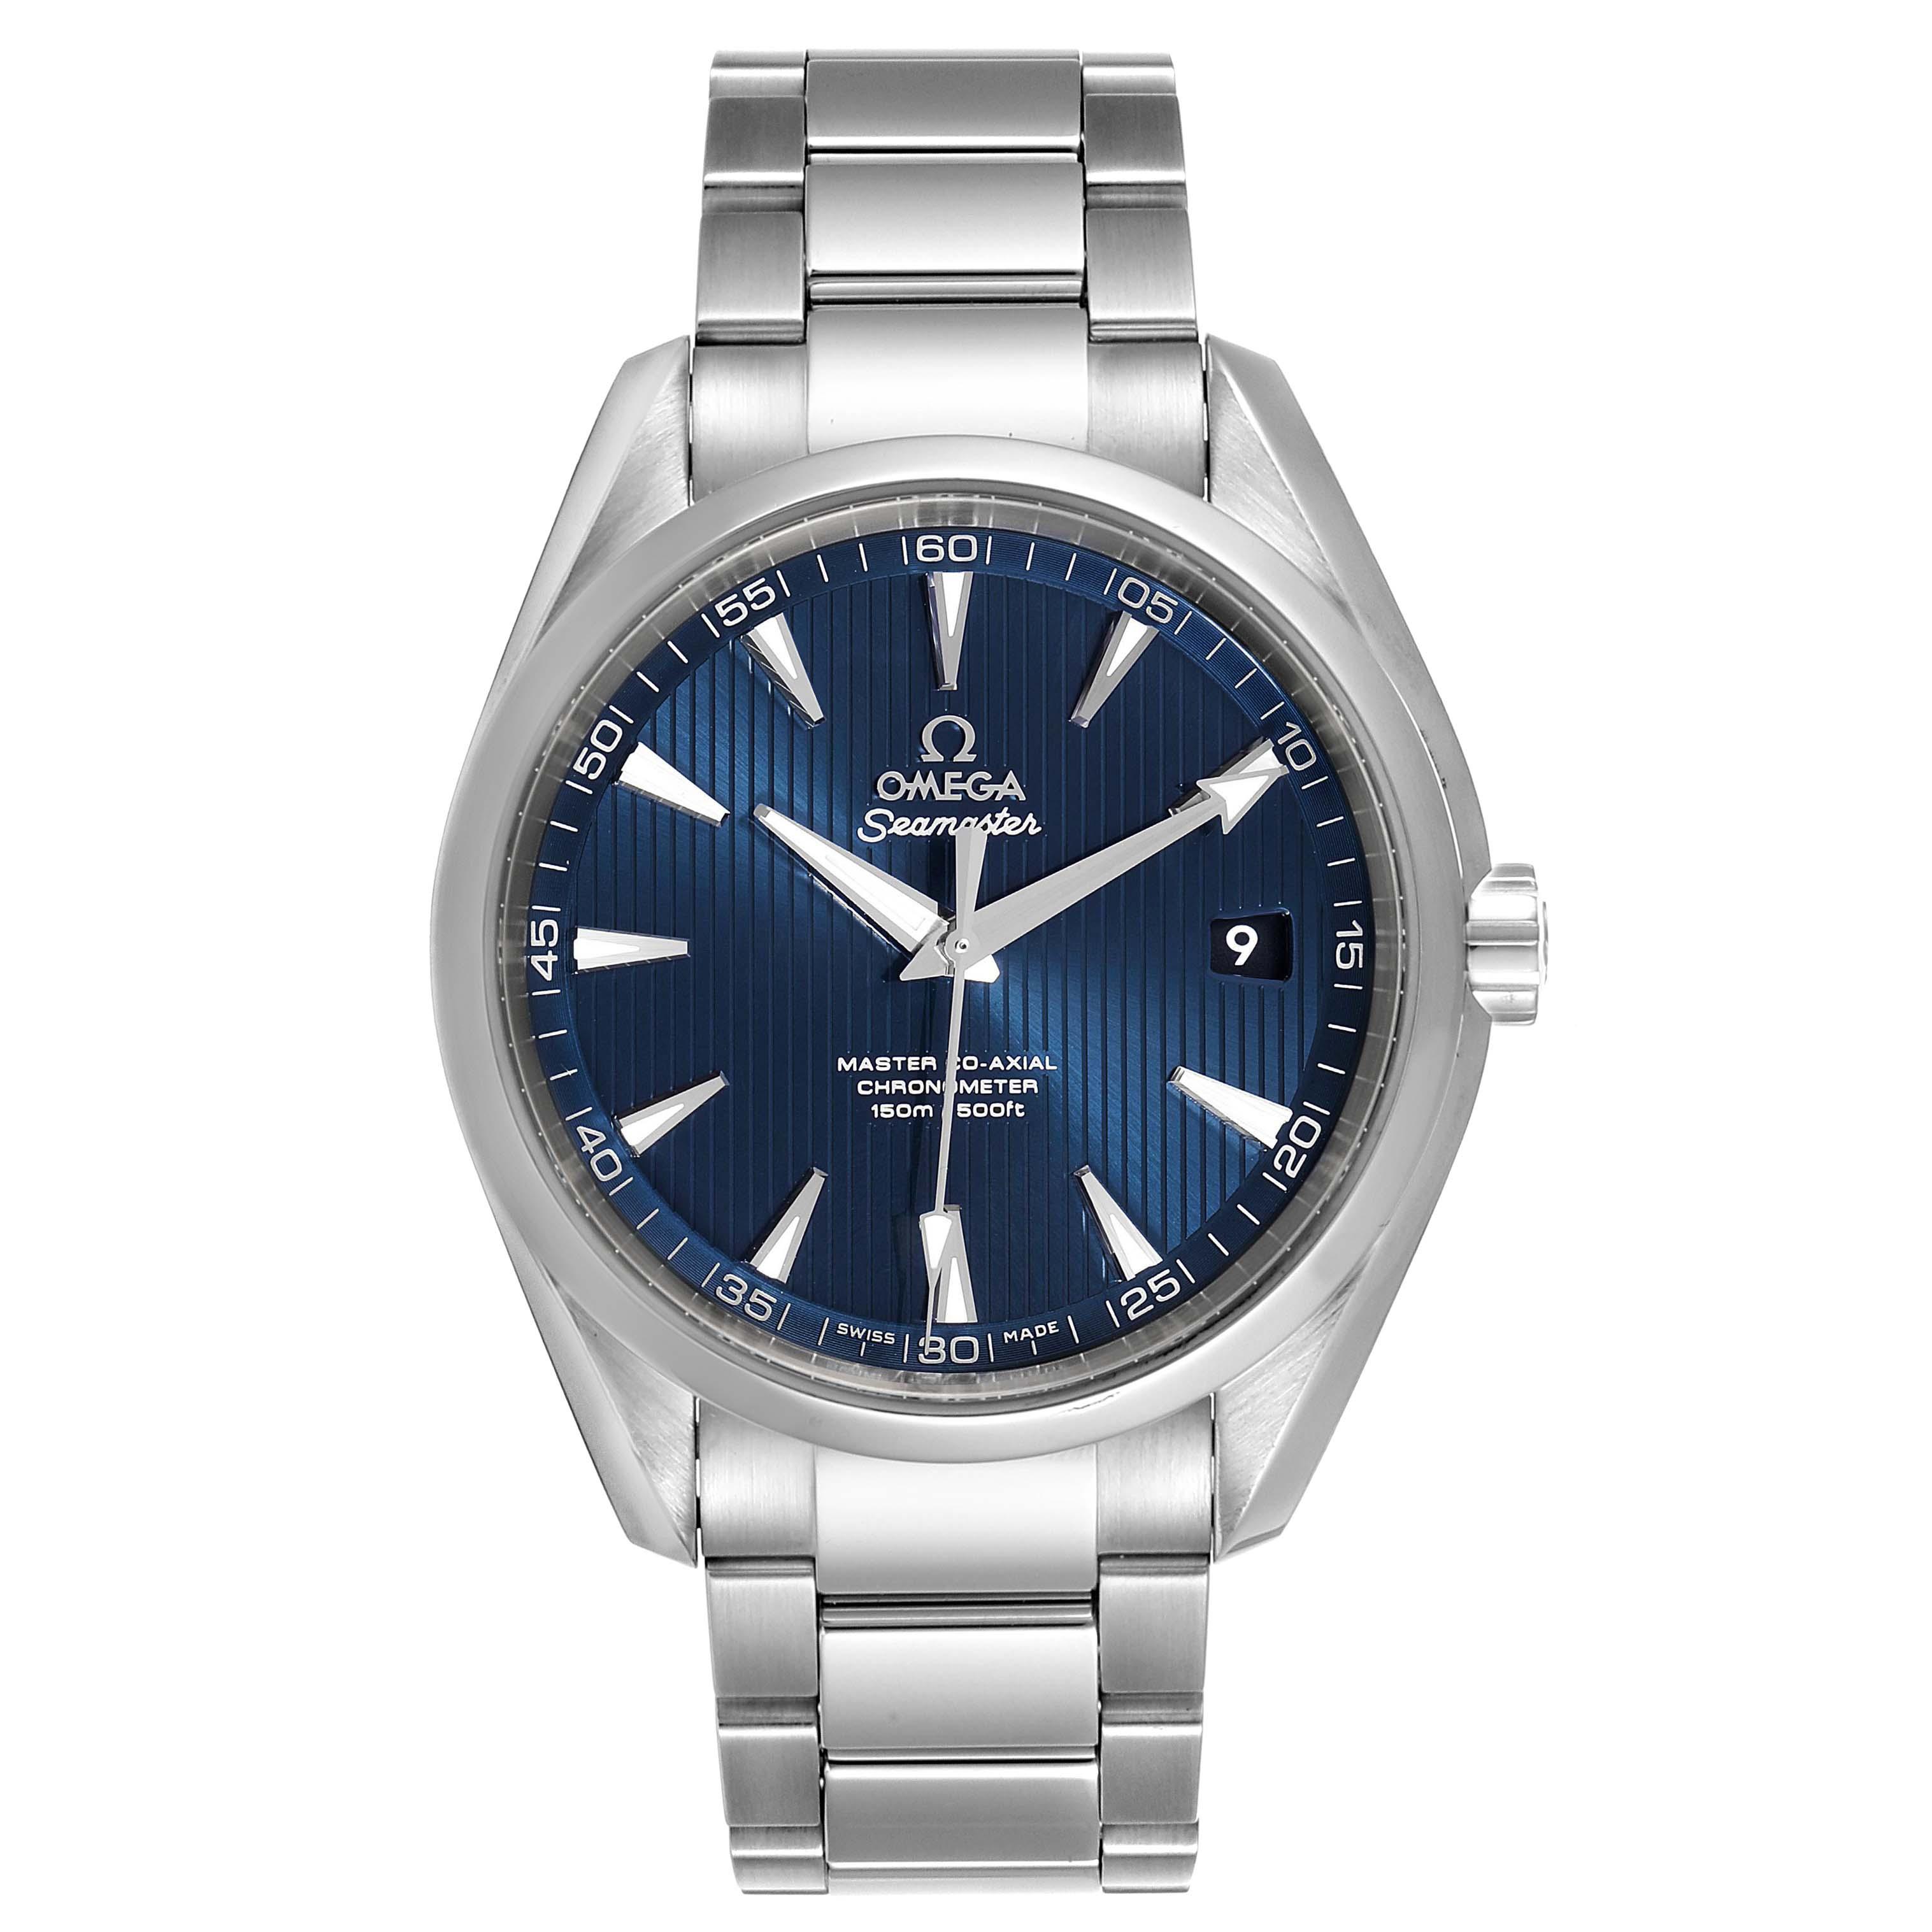 Omega Seamaster Aqua Terra Blue Dial Mens Watch 231.10.42.21.03.003 SwissWatchExpo